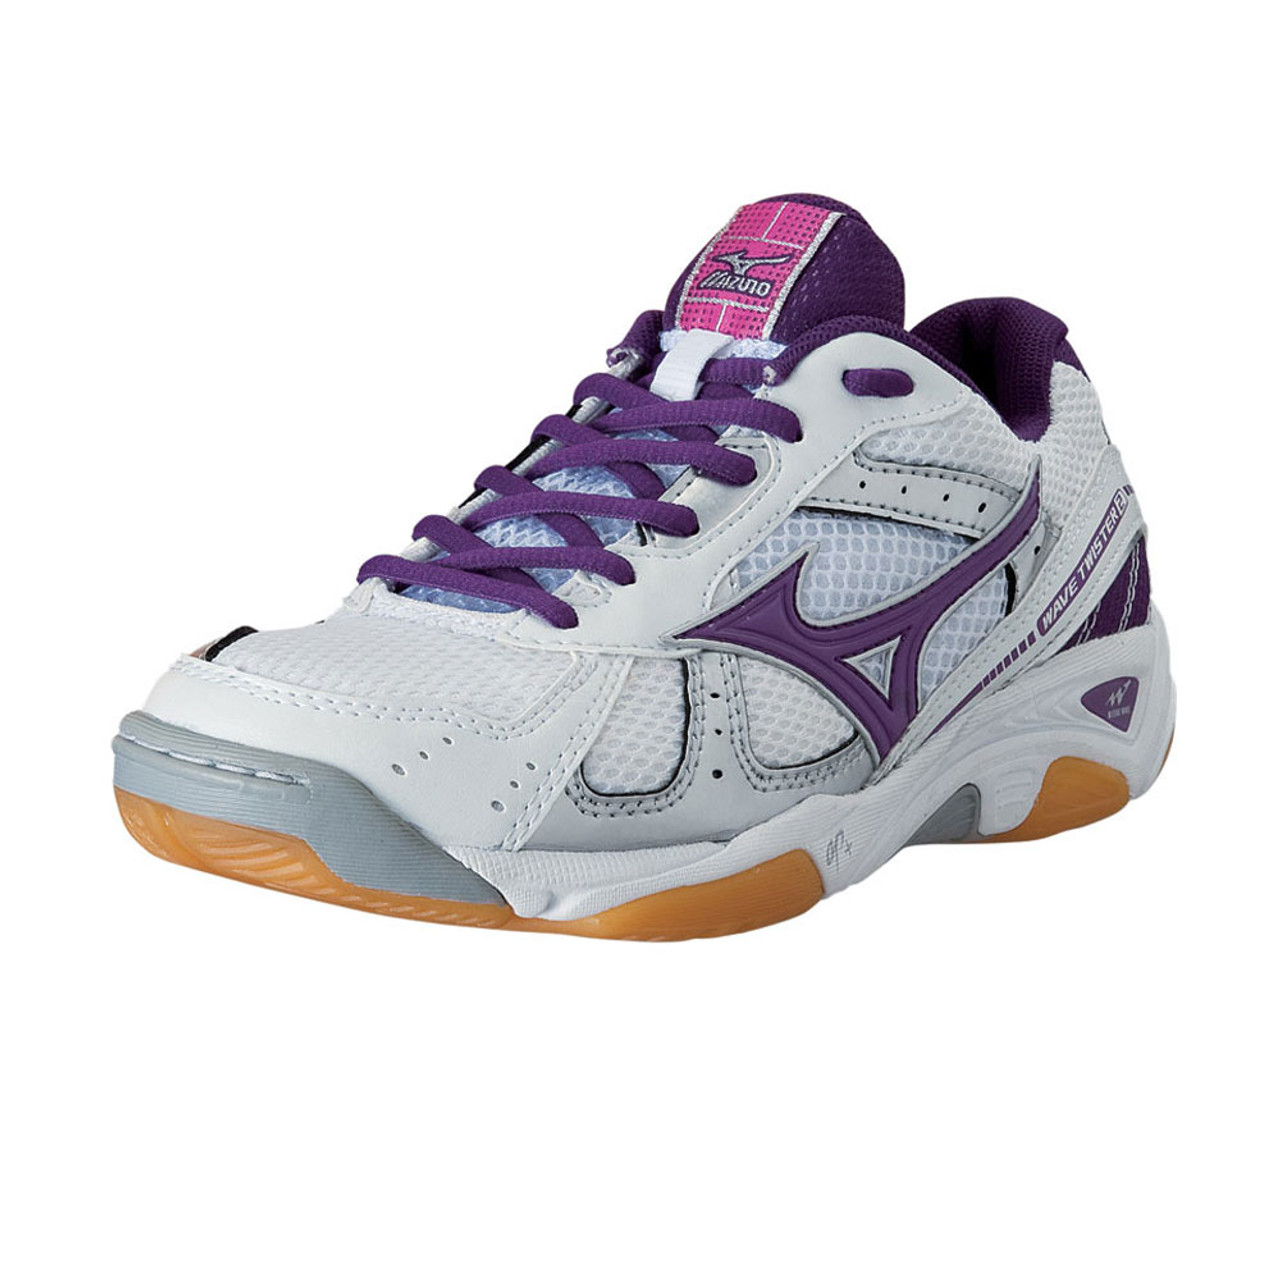 mizuno shoes size table in usa canada ks